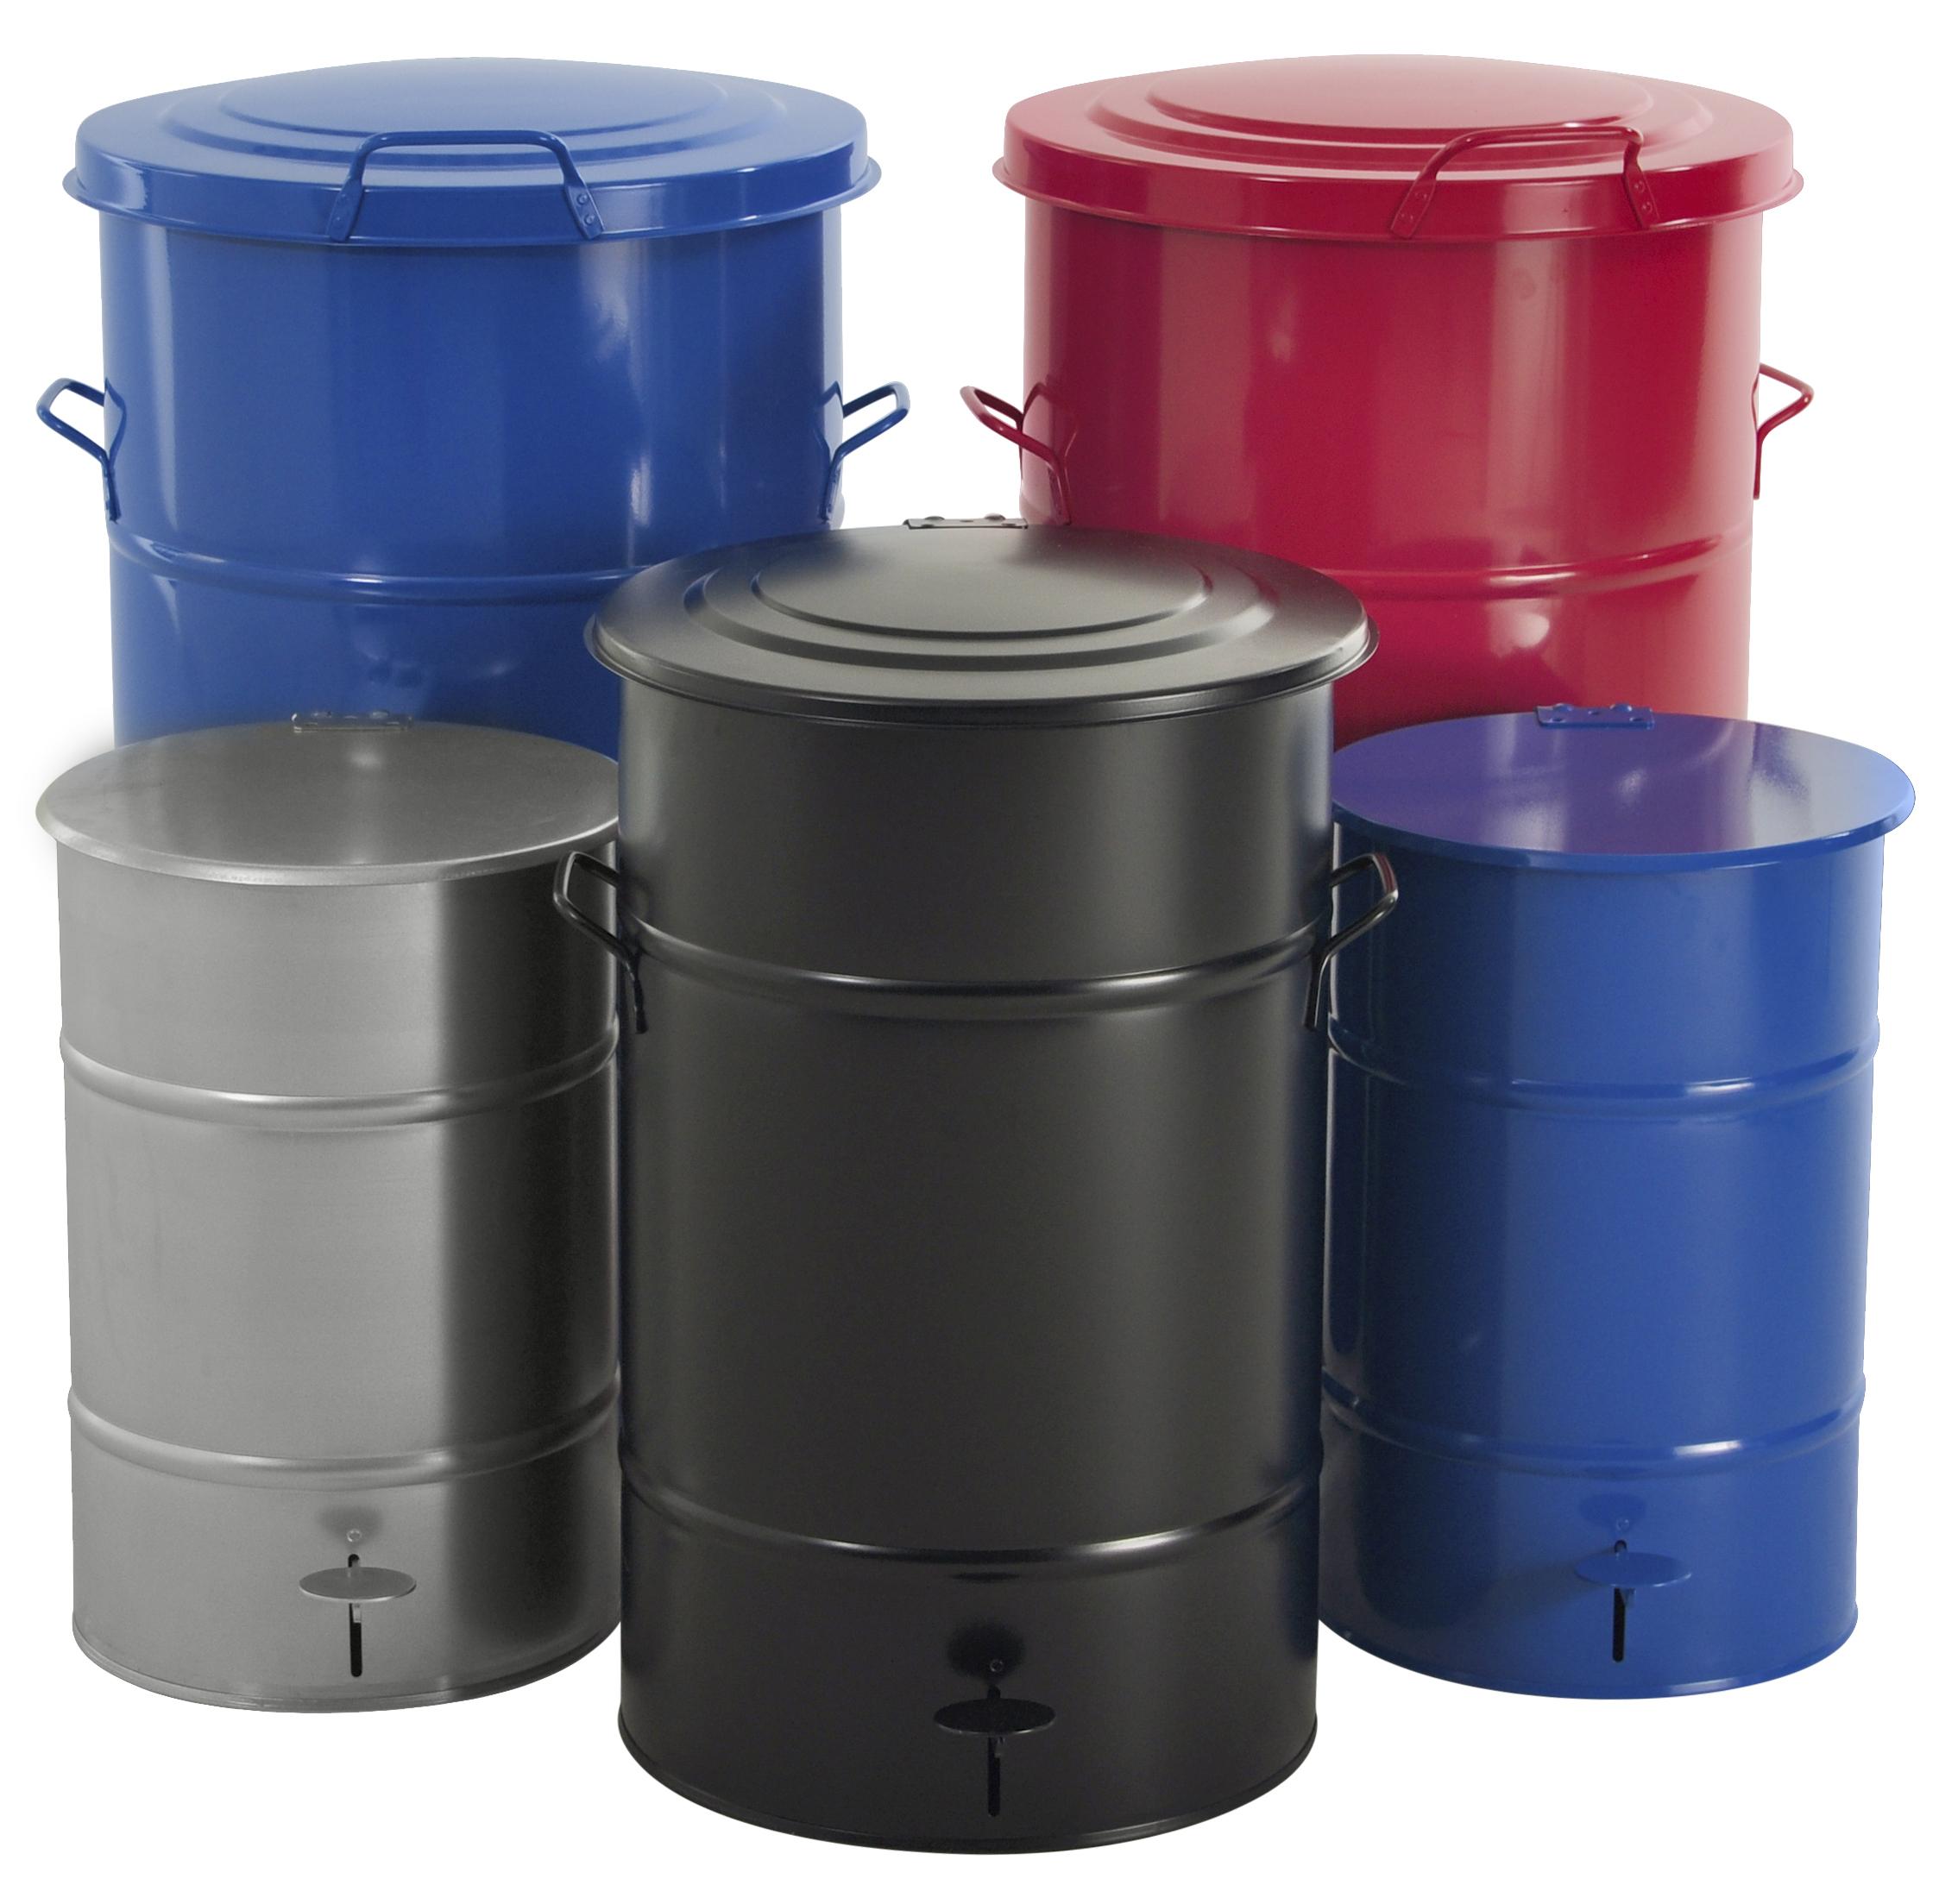 KM70BF | Waste bins 70L